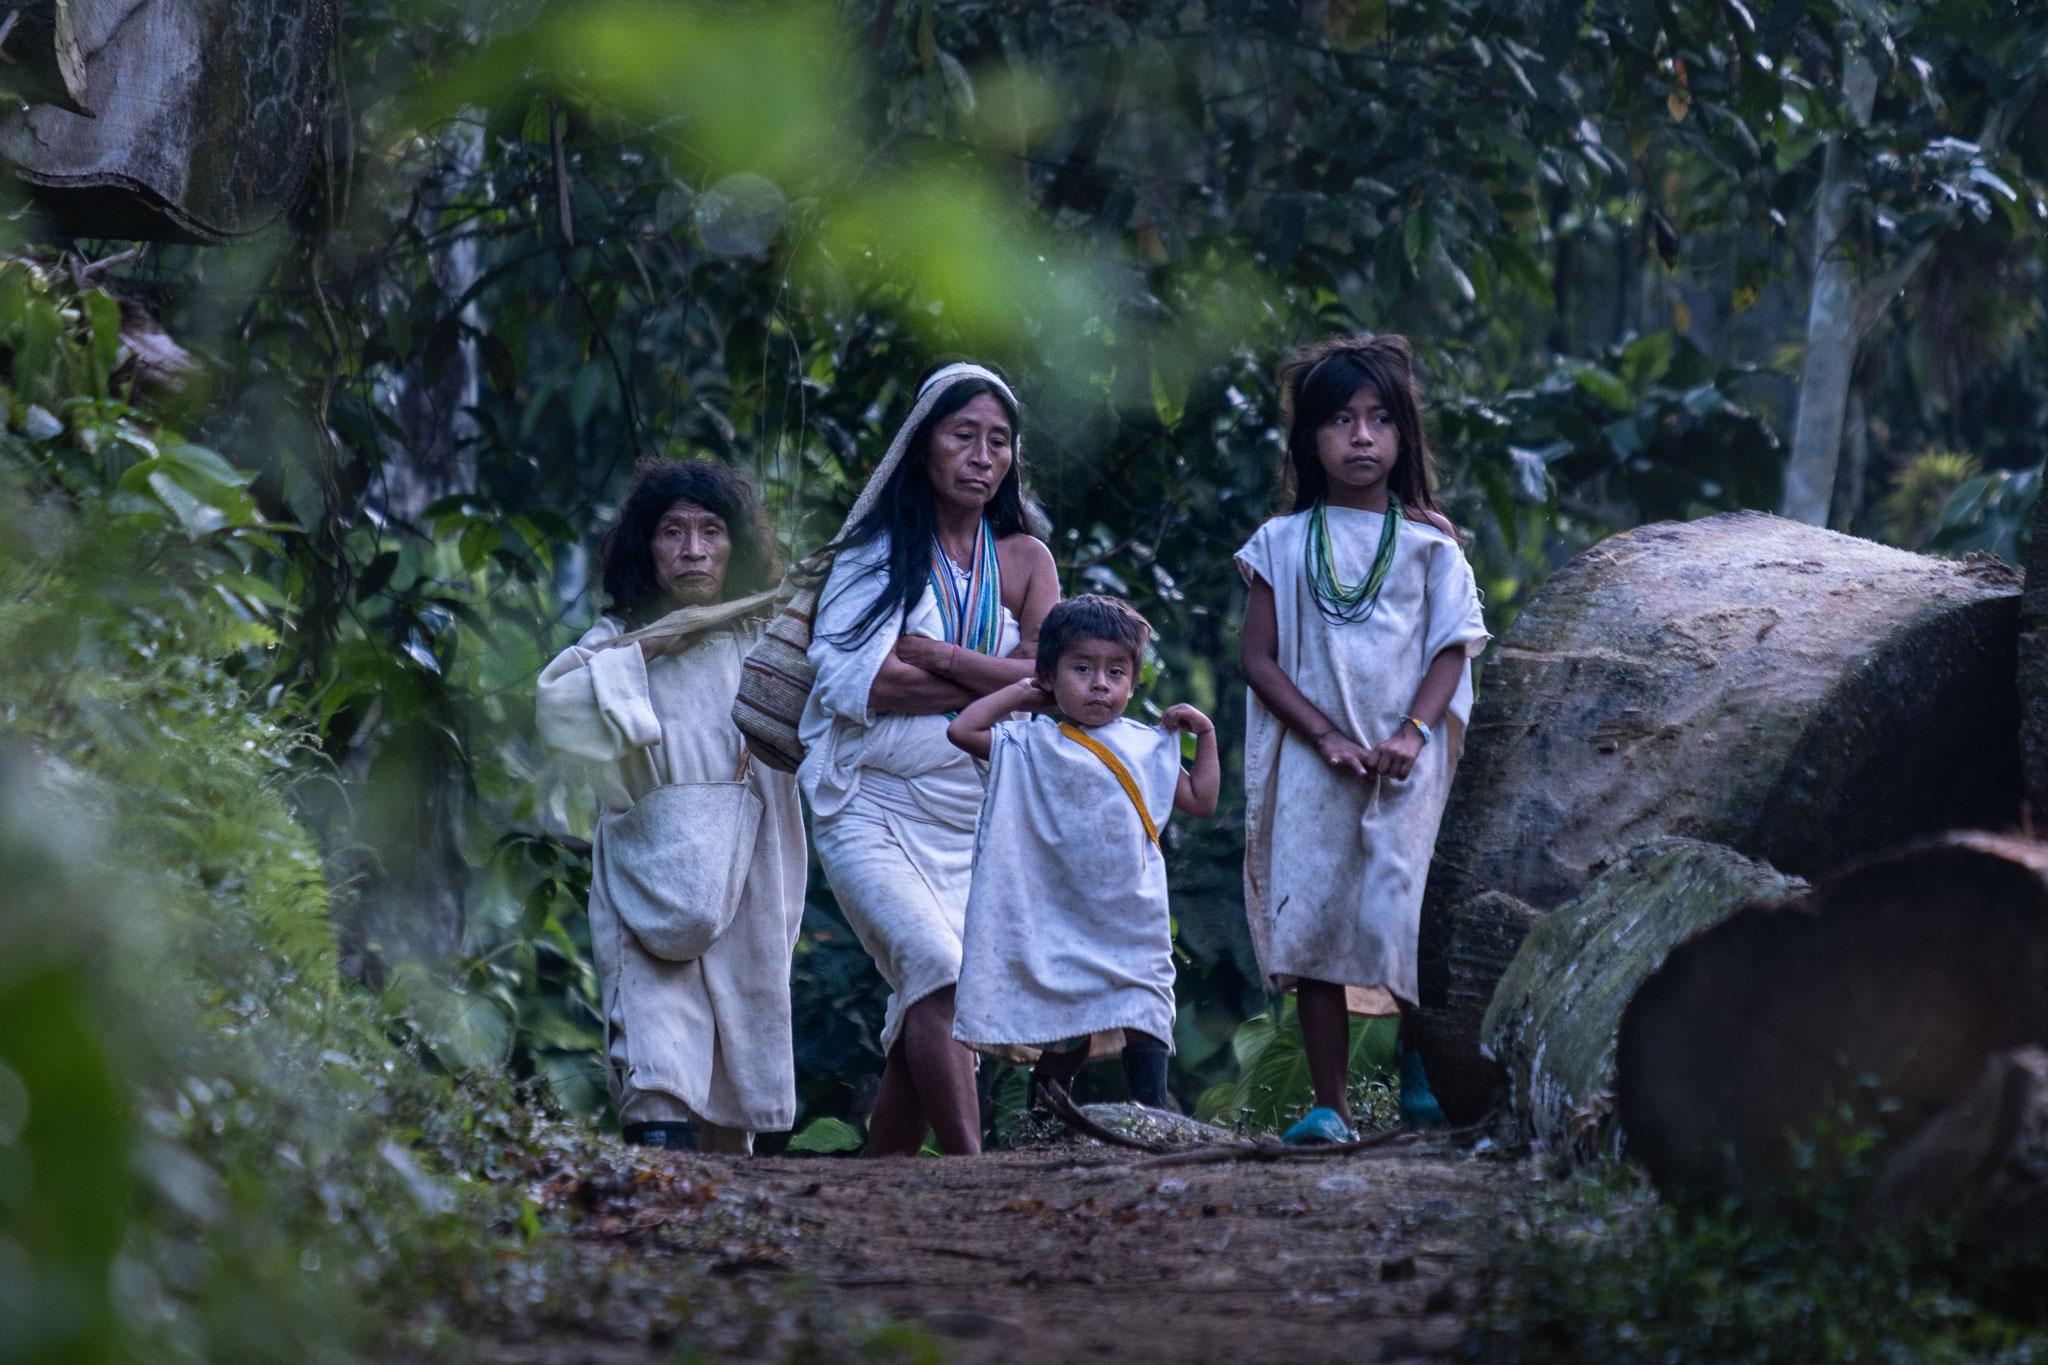 KOGI INDIGENOUS FAMILY IN THE SIERRA NEVADA DE SANTA MARTA